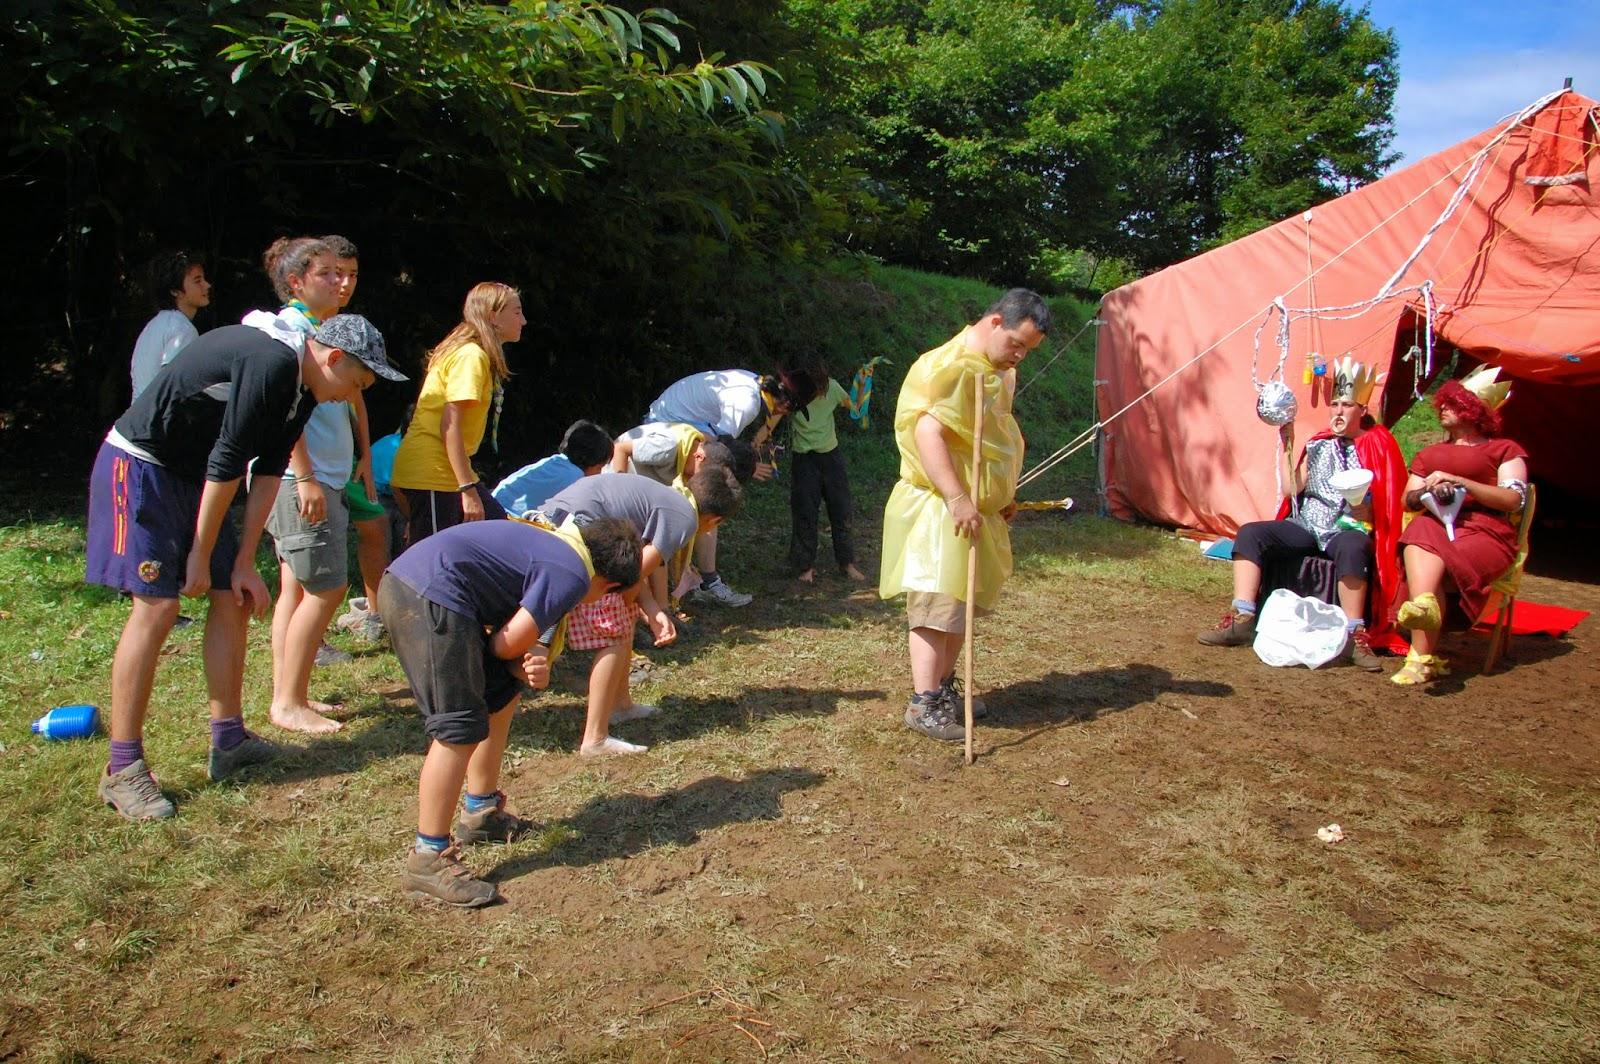 Campaments Estiu RolandKing 2011 - DSC_0204.JPG